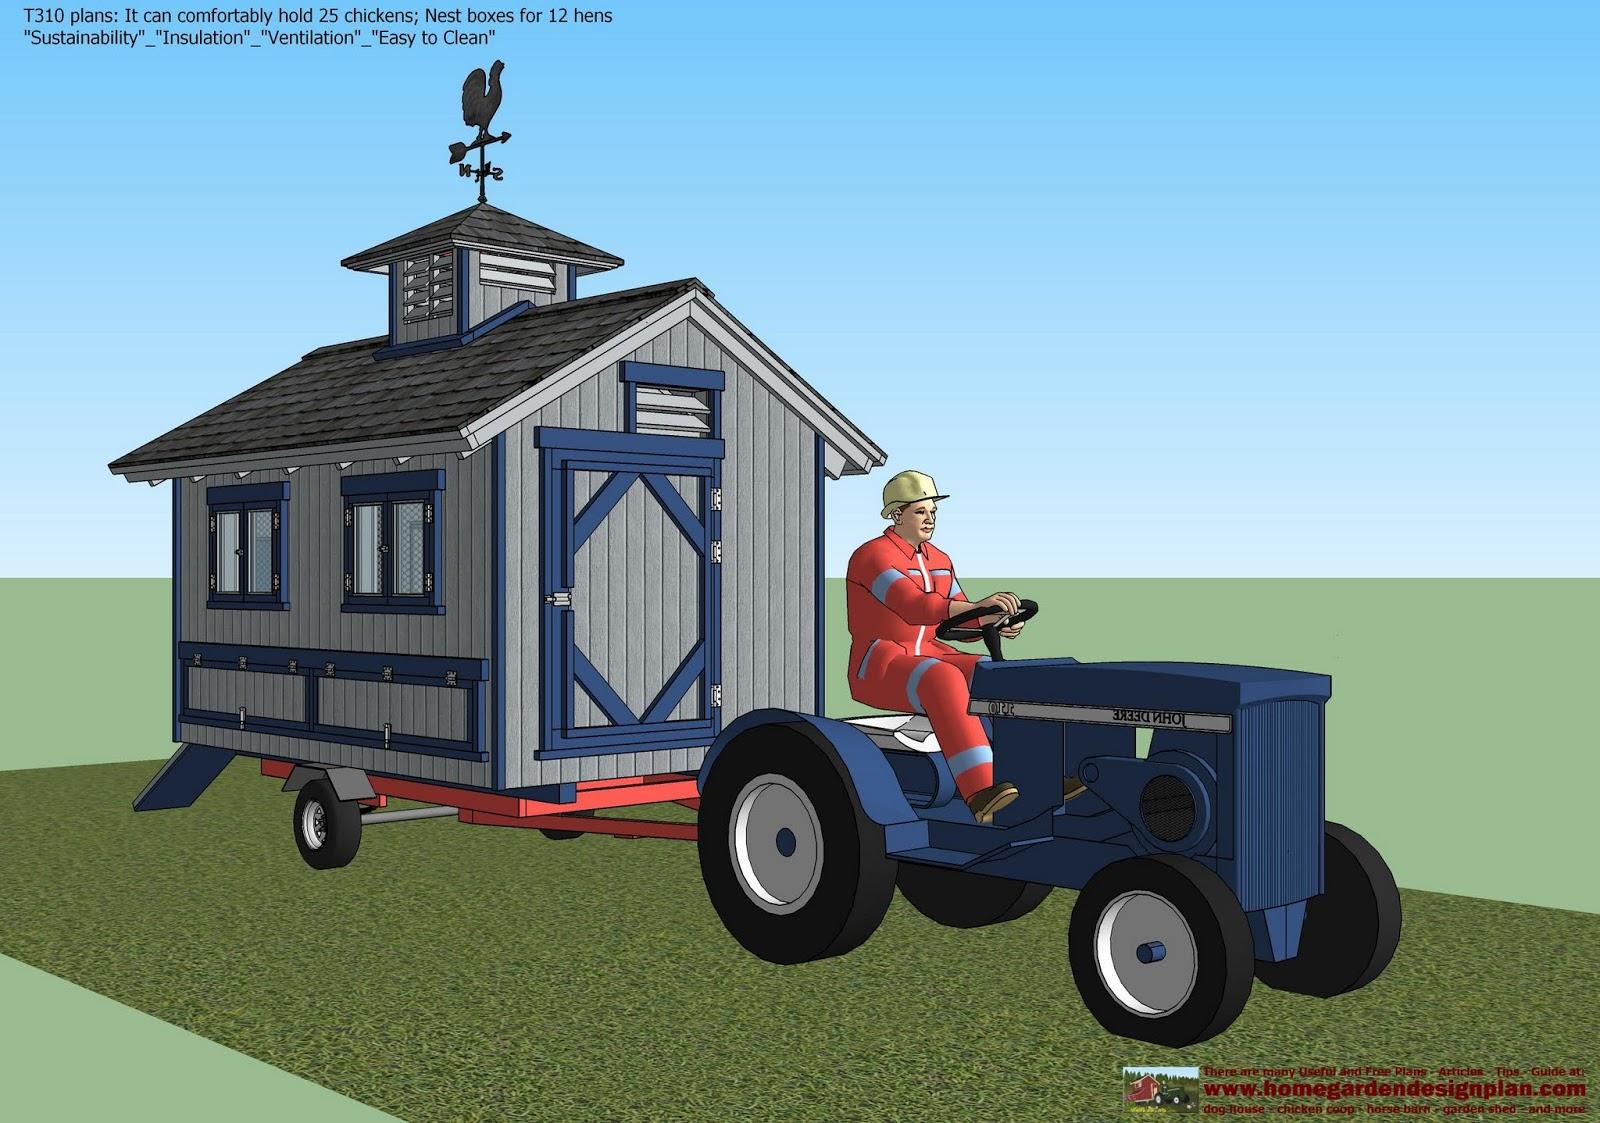 Home garden plans t310 chicken trailer plans for Garden design trailer